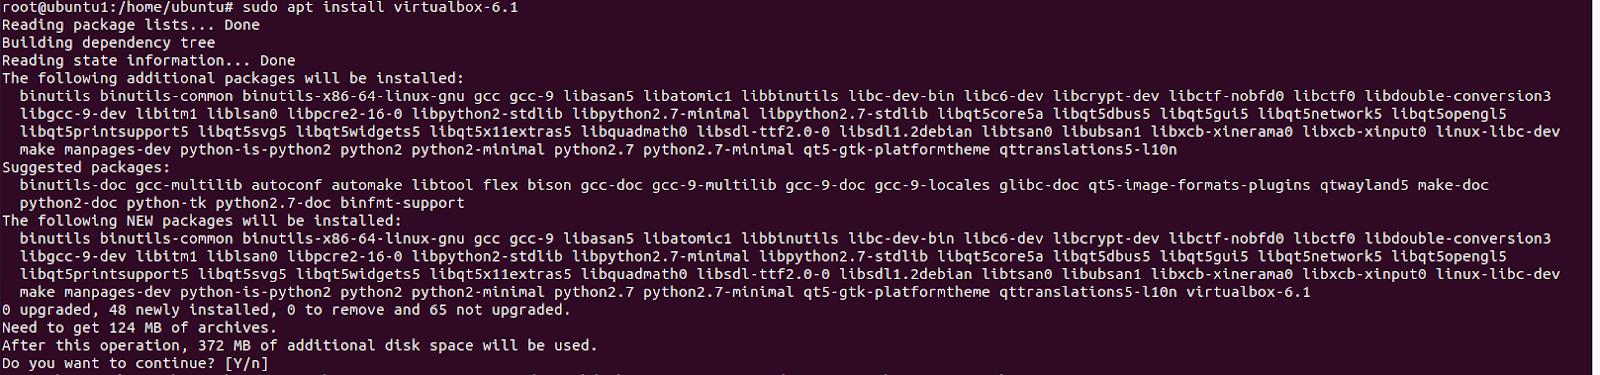 Install VirtualBox 6.1 on Ubuntu